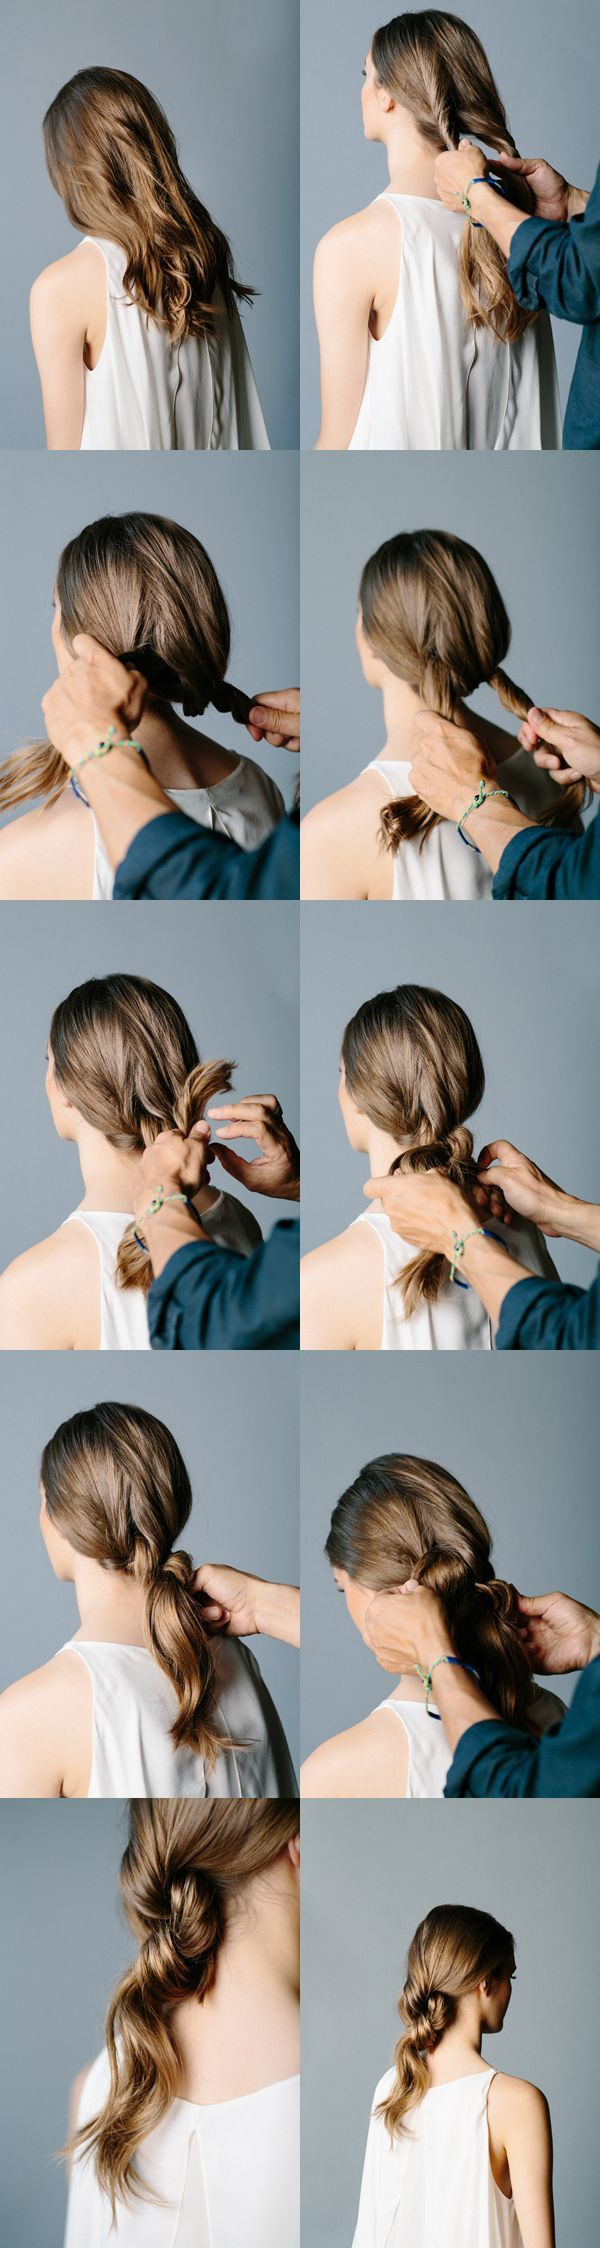 DIY Ideas Hair & Beauty : DIY Double Knot Ponytail | DIY Weddings | OnceWed.com